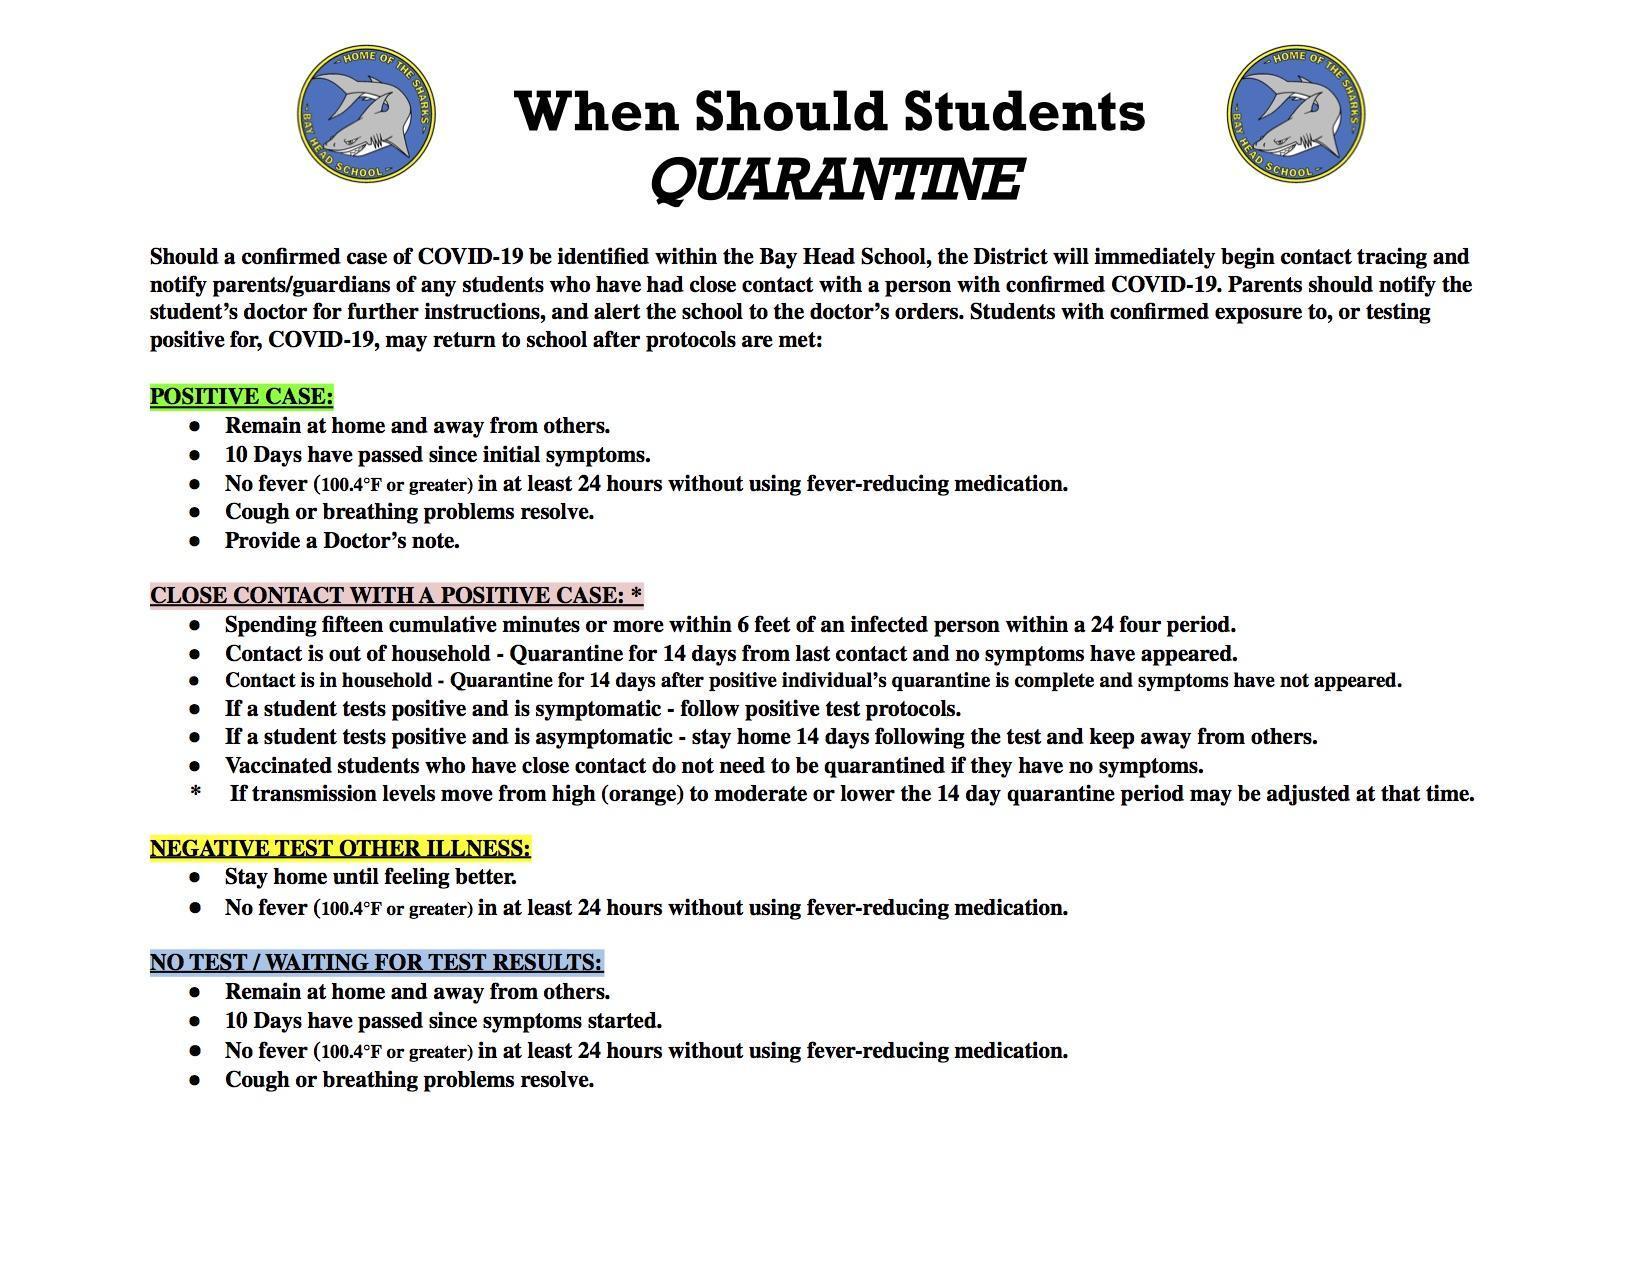 Informational Quarantine Sheet